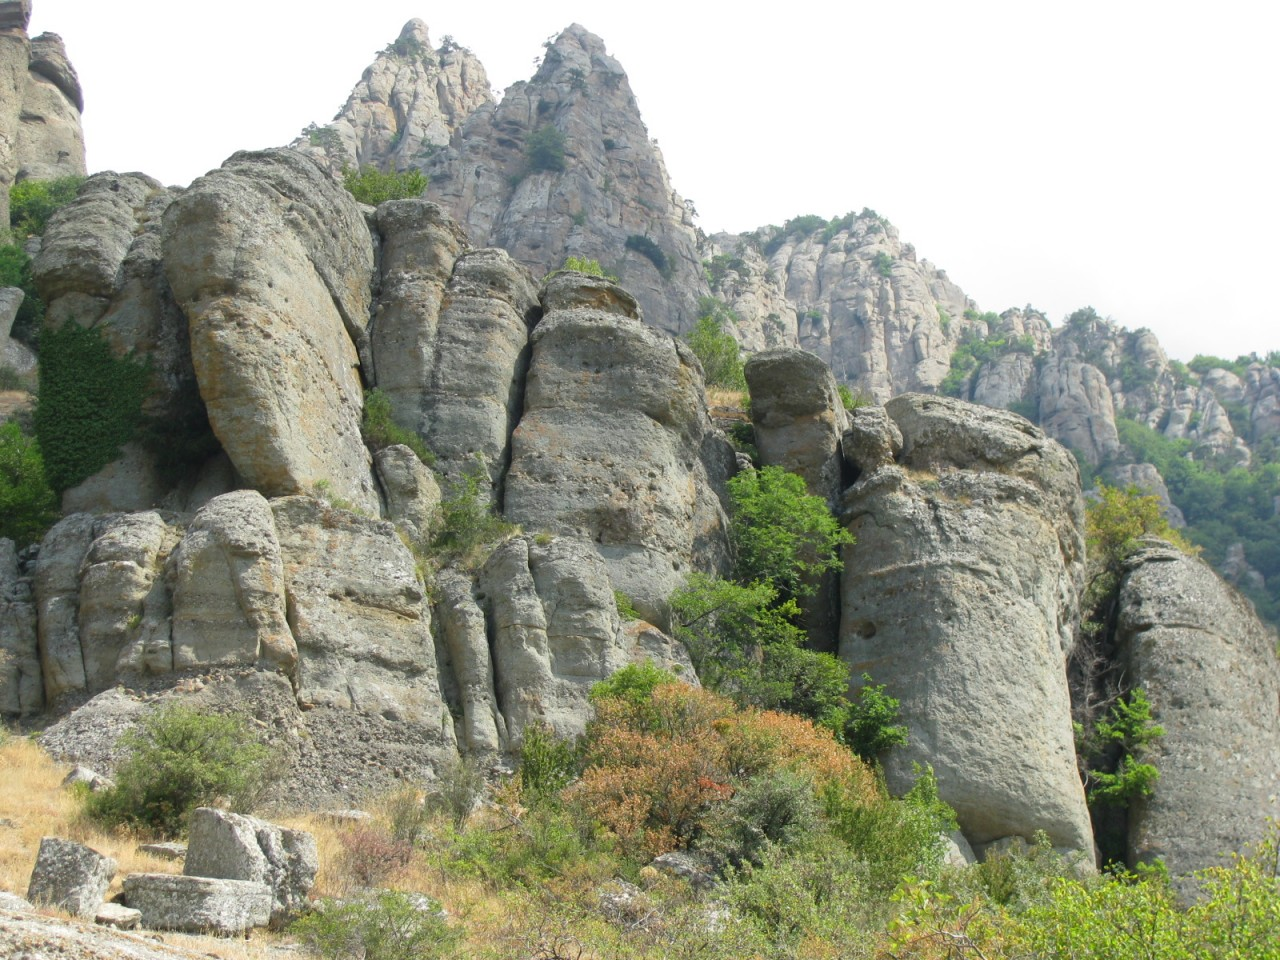 10. ...И снова Крым! Гора Демерджи. Водопад Джур-Джур